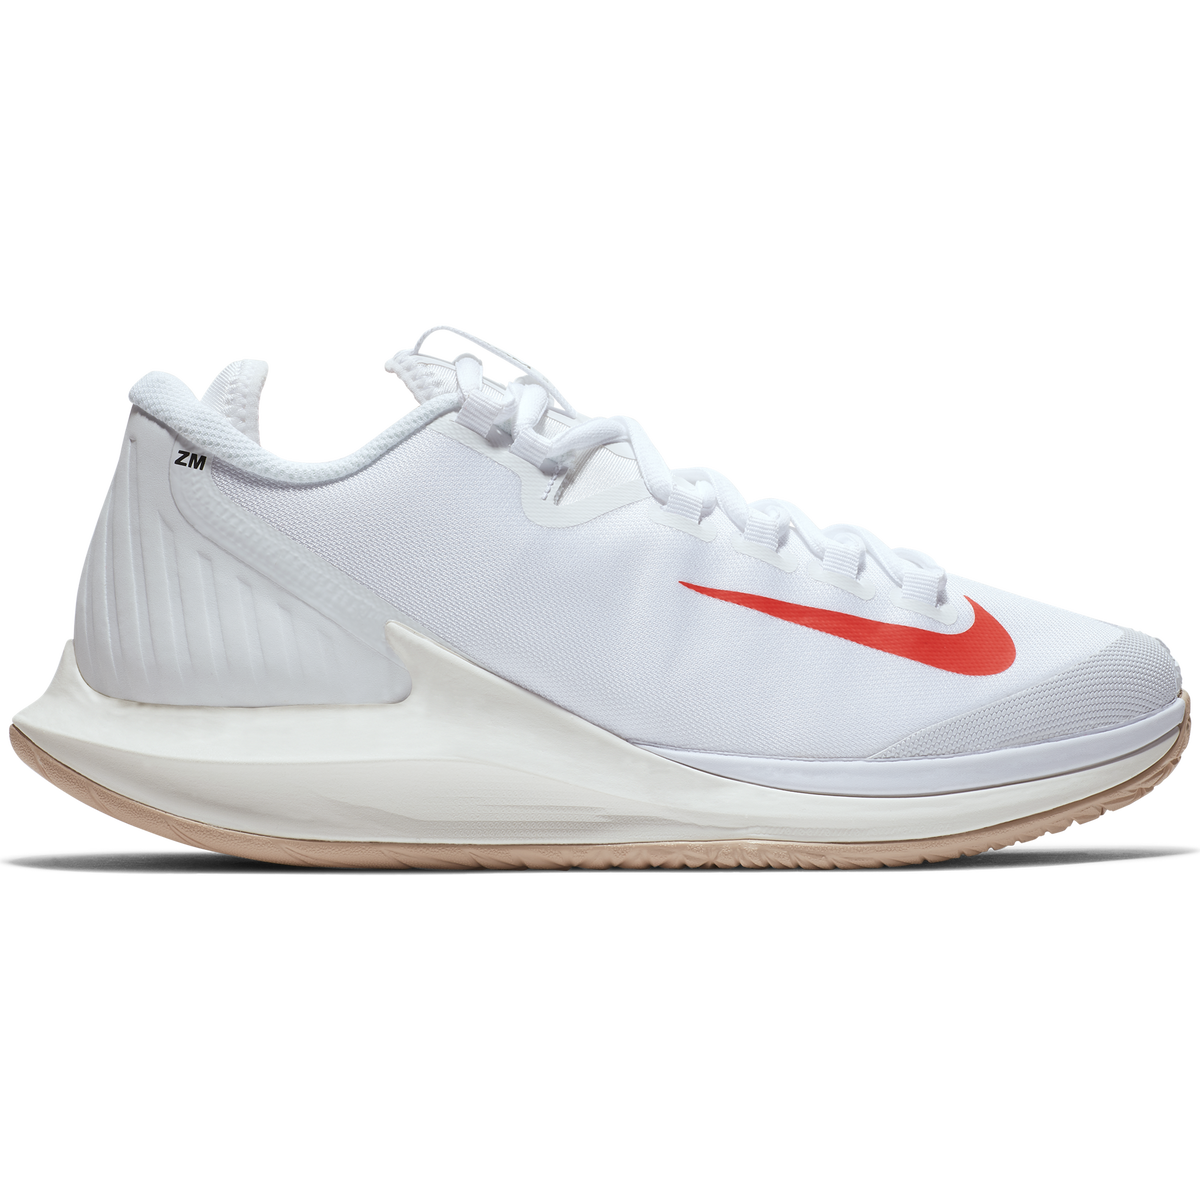 84856f0da9d8 NikeCourt Air Zoom Zero Women s Tennis Shoe - White Pink